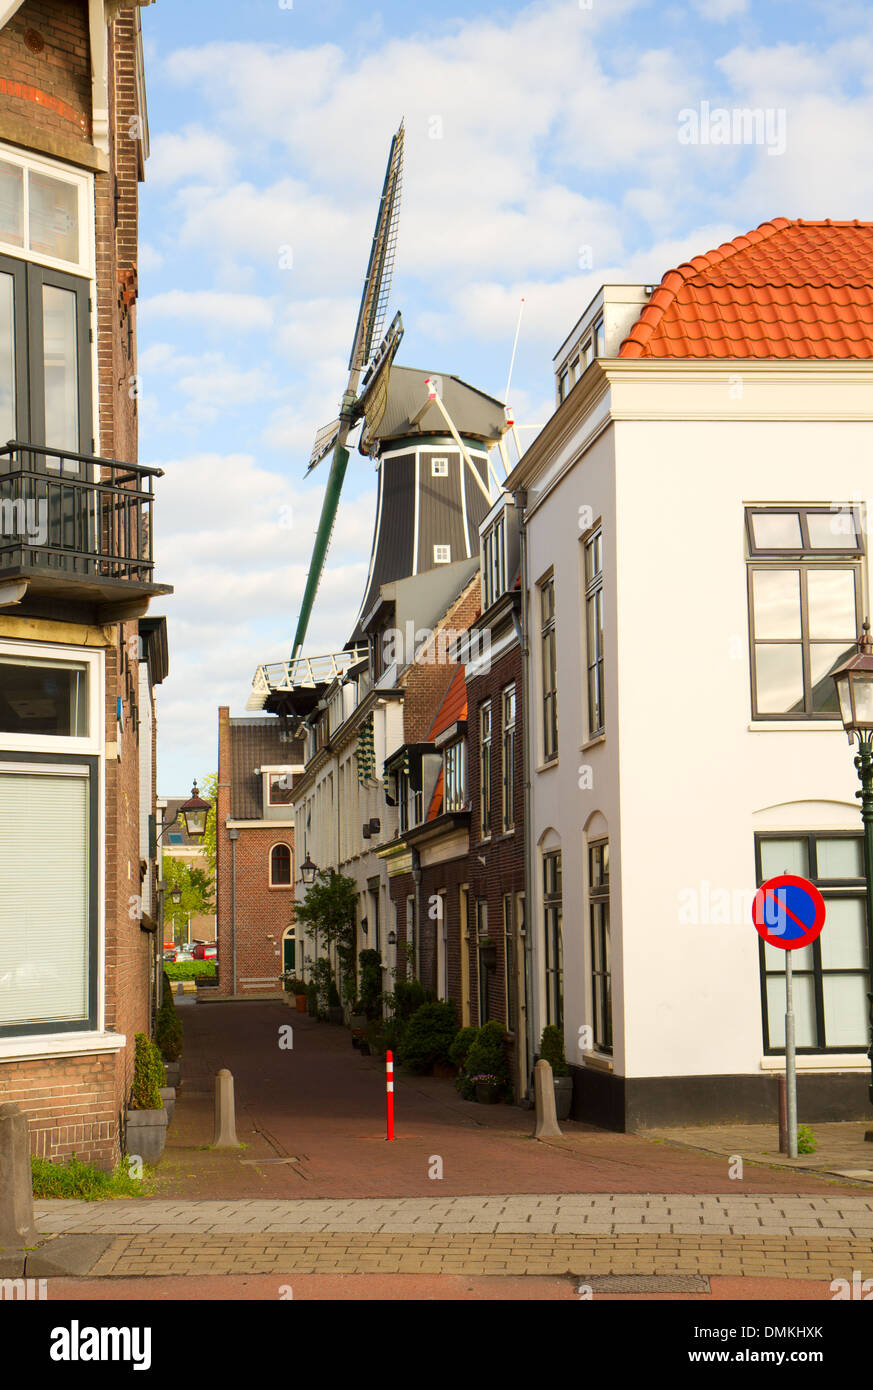 Adriaan windmill over street, Haarlem - Stock Image